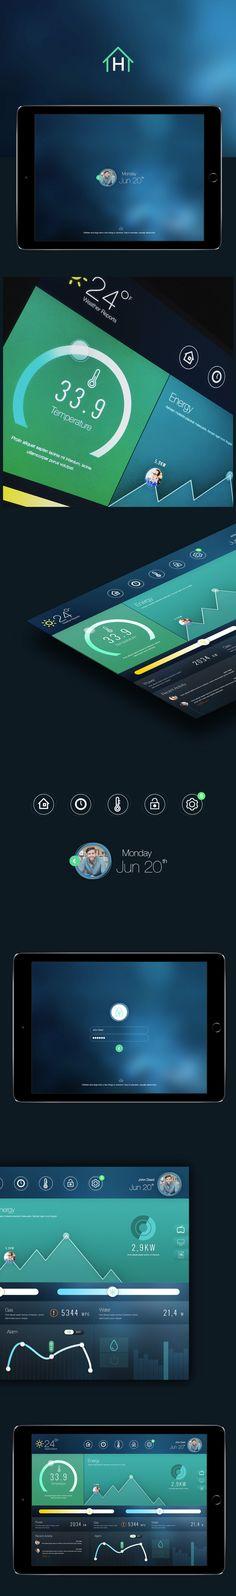 Home Dashboard (by Cüneyt ŞEN) #app #concept #behance